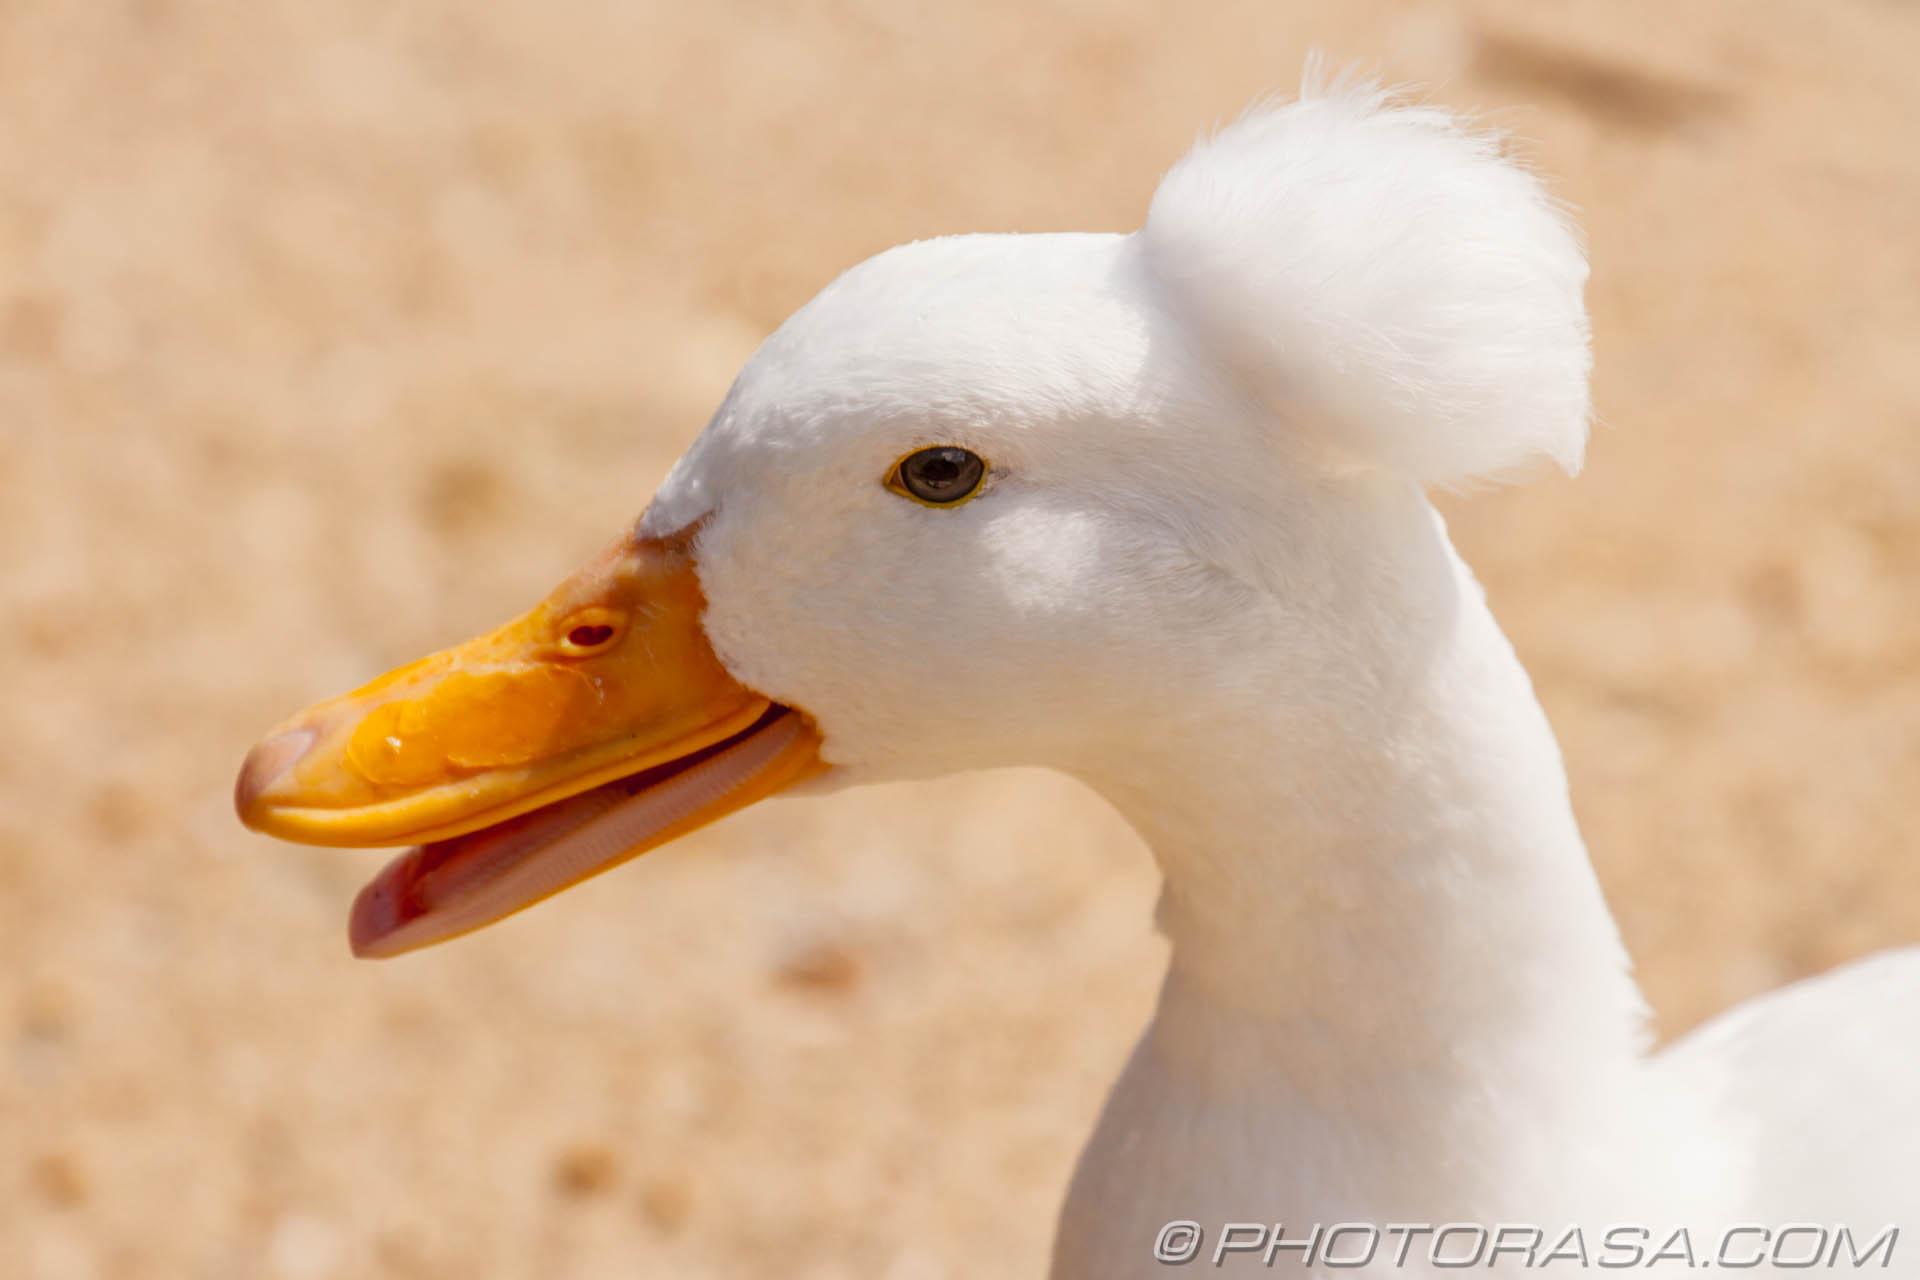 http://photorasa.com/birds-greenworld/quacking-white-crested-runner/